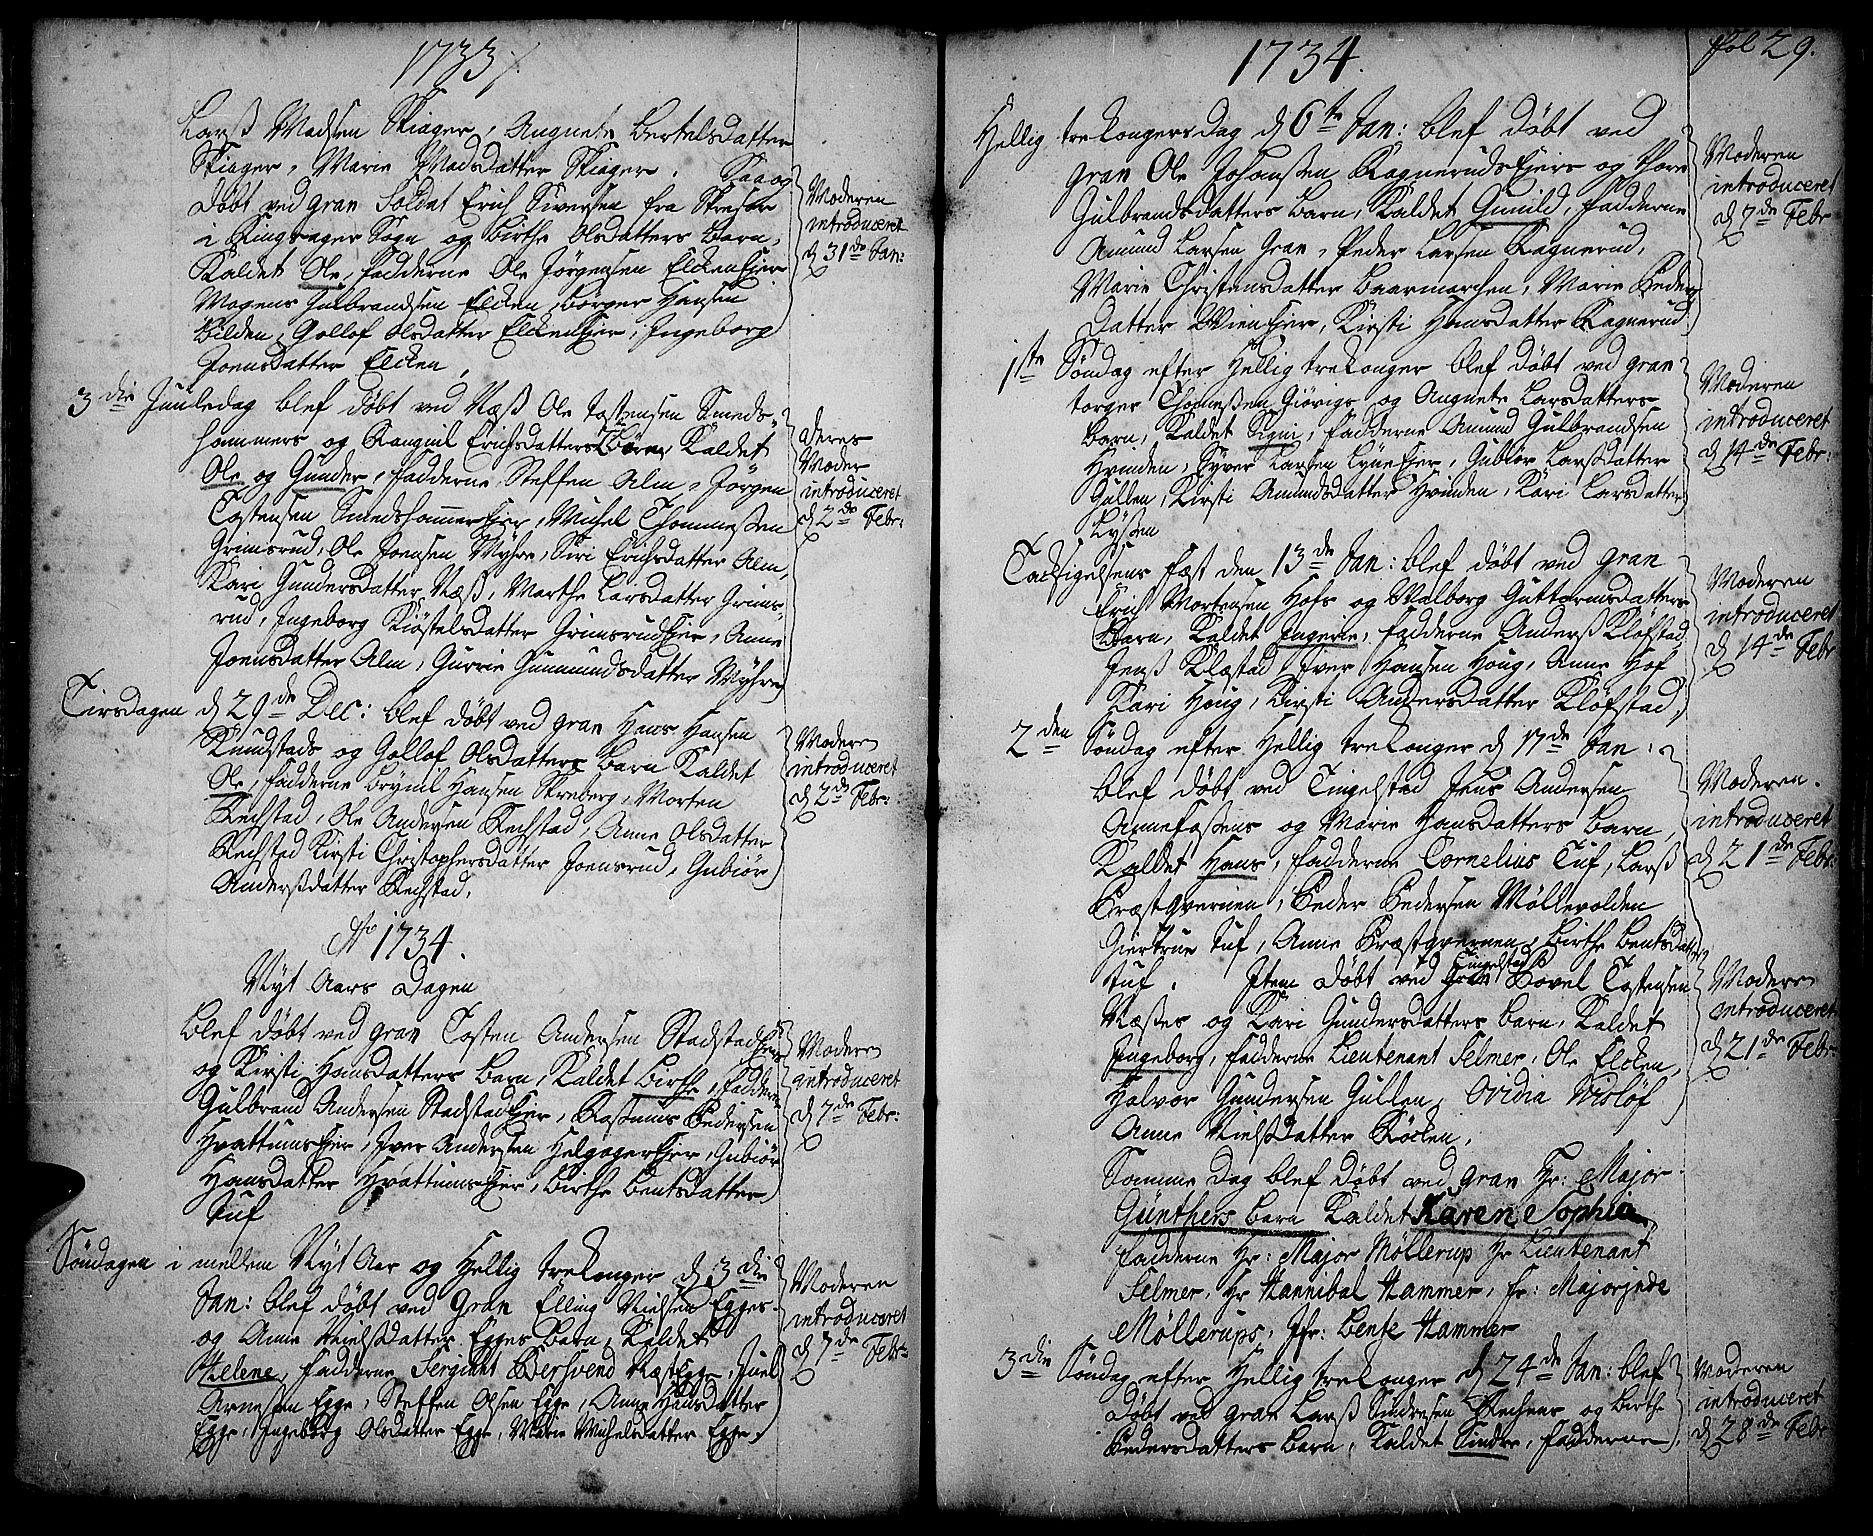 SAH, Gran prestekontor, Ministerialbok nr. 2, 1732-1744, s. 29